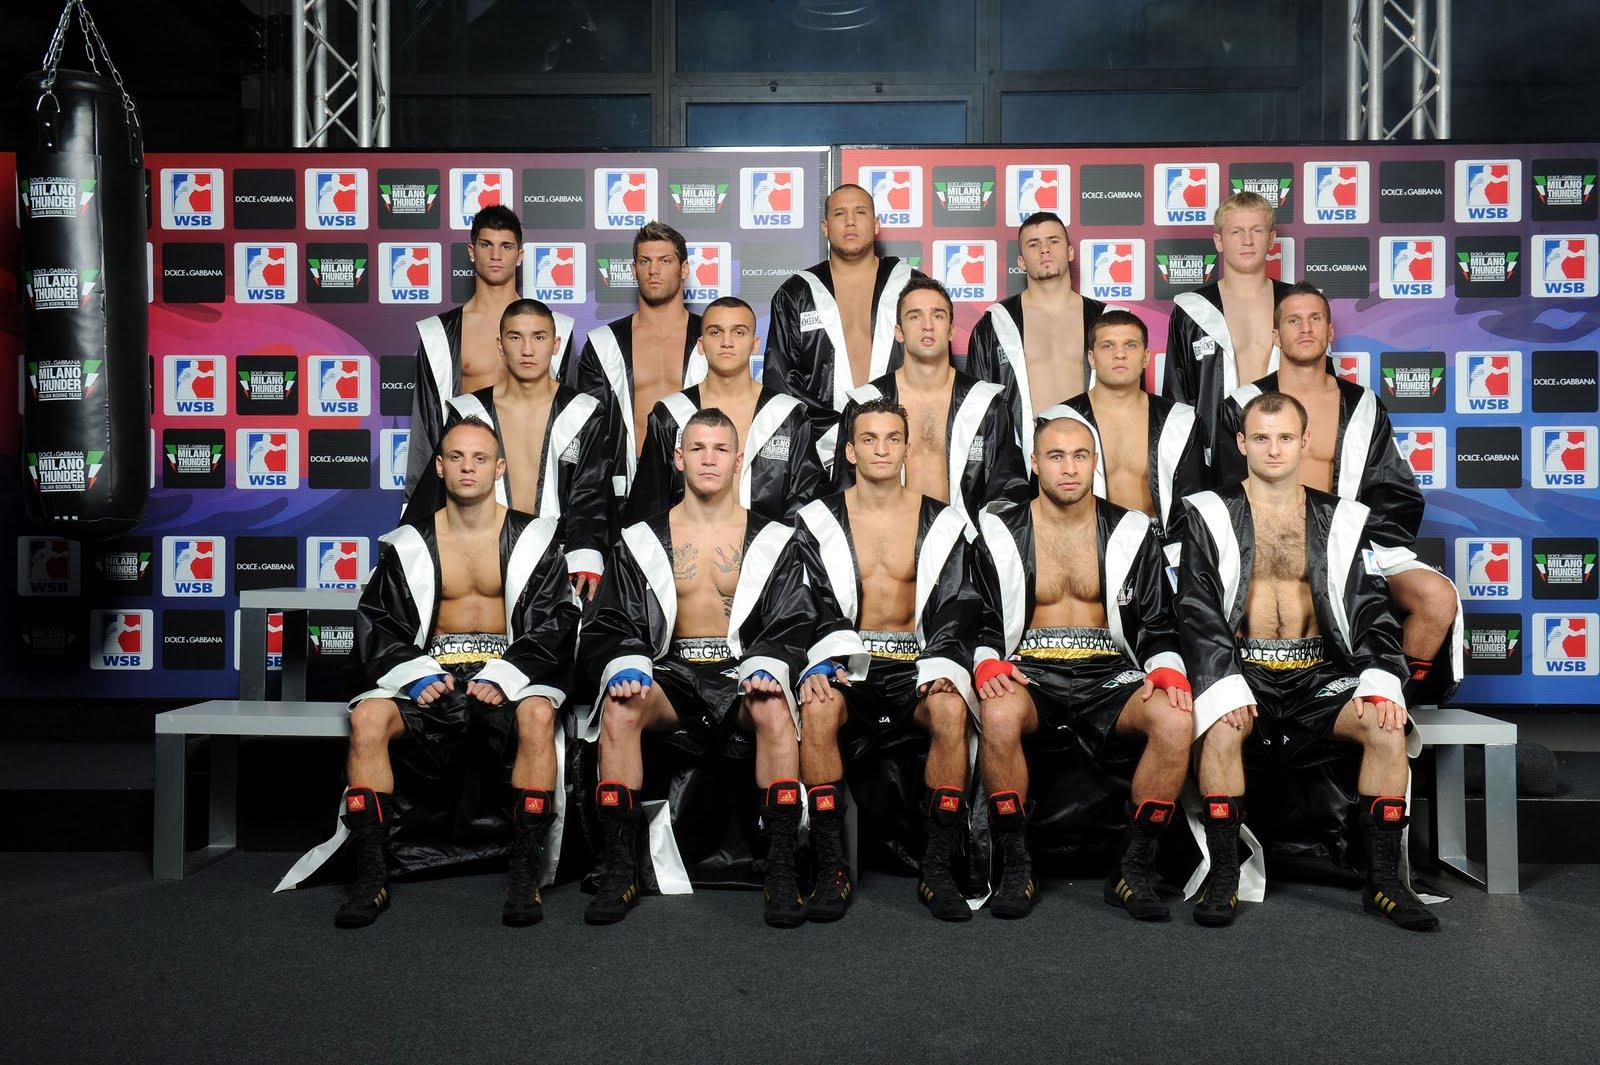 Dolce&;gabbana - milano thunder italian boxing team